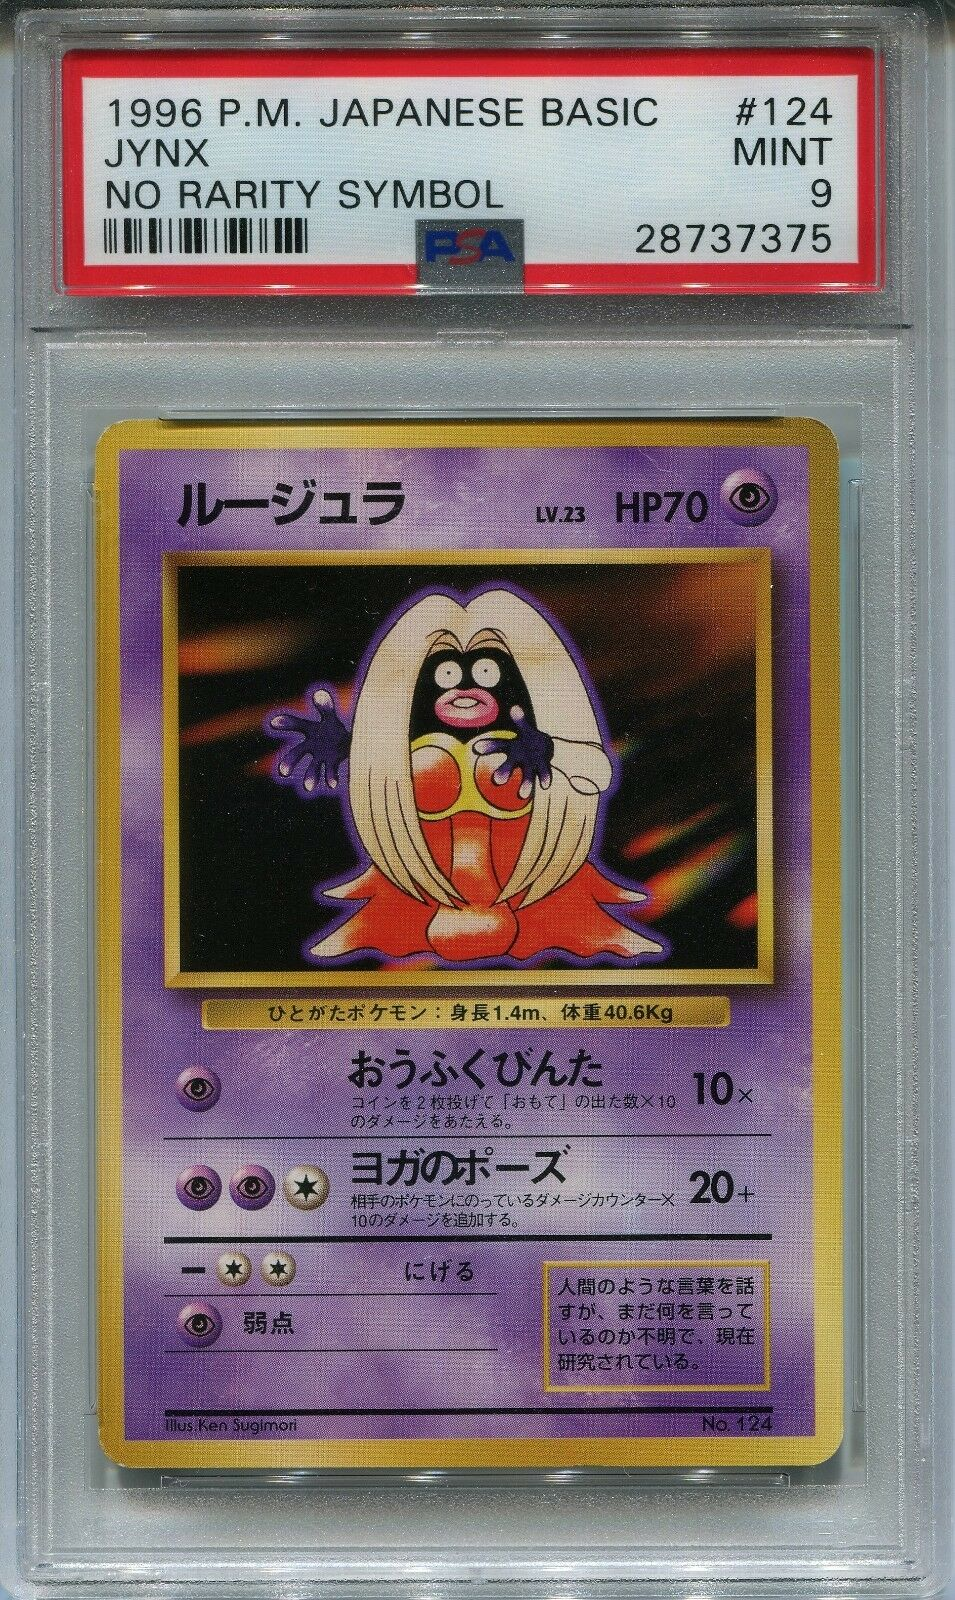 Pokemon 1996 Japanese Base Set Jynx No Rarity Symbol Symbol Symbol ERROR CARD PSA MINT 9  d39526